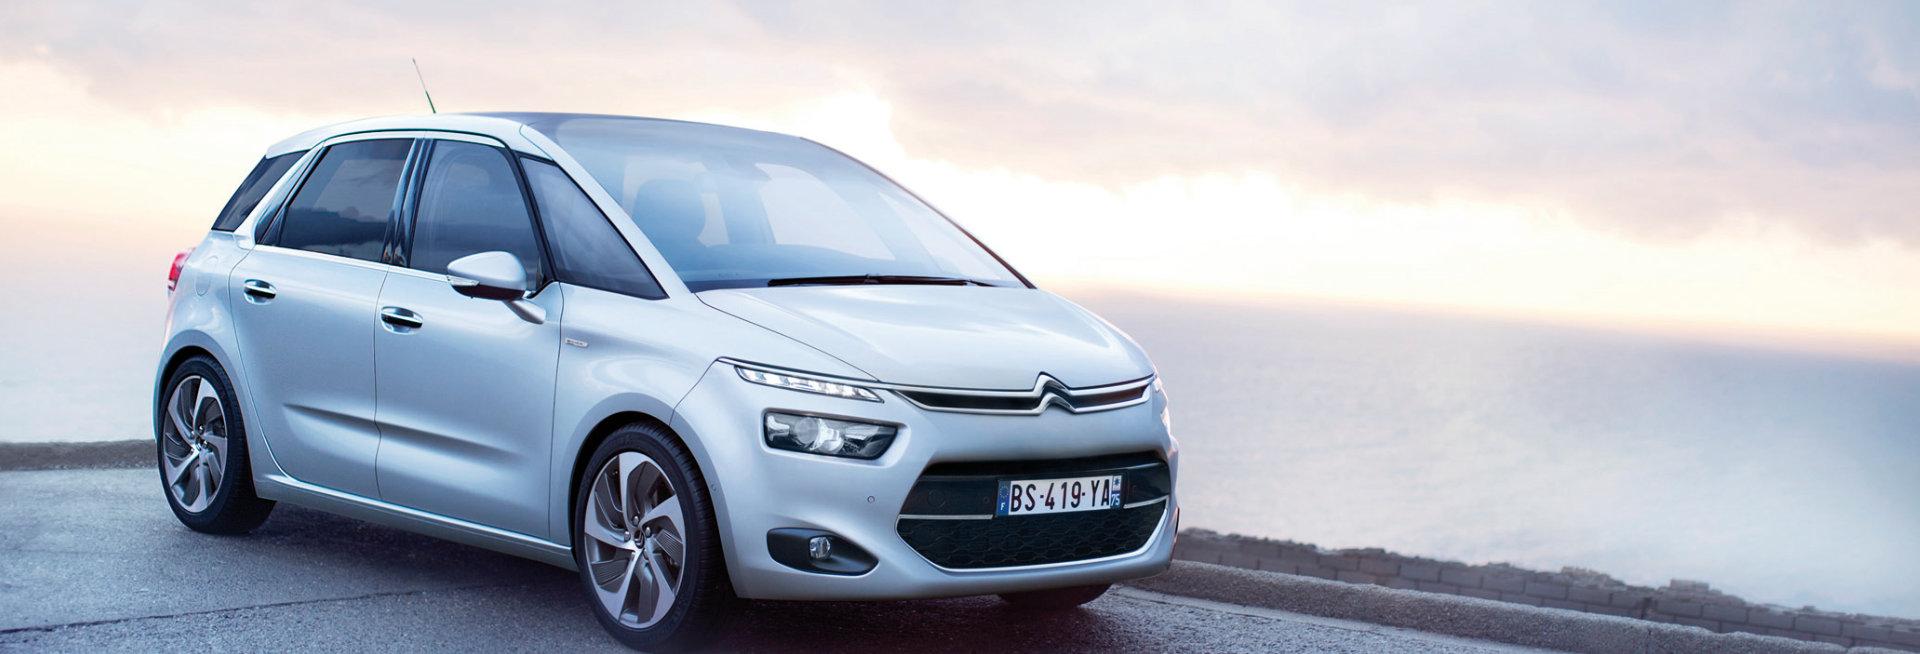 Citroën Grand C4 Picasso sneeuwkettingen